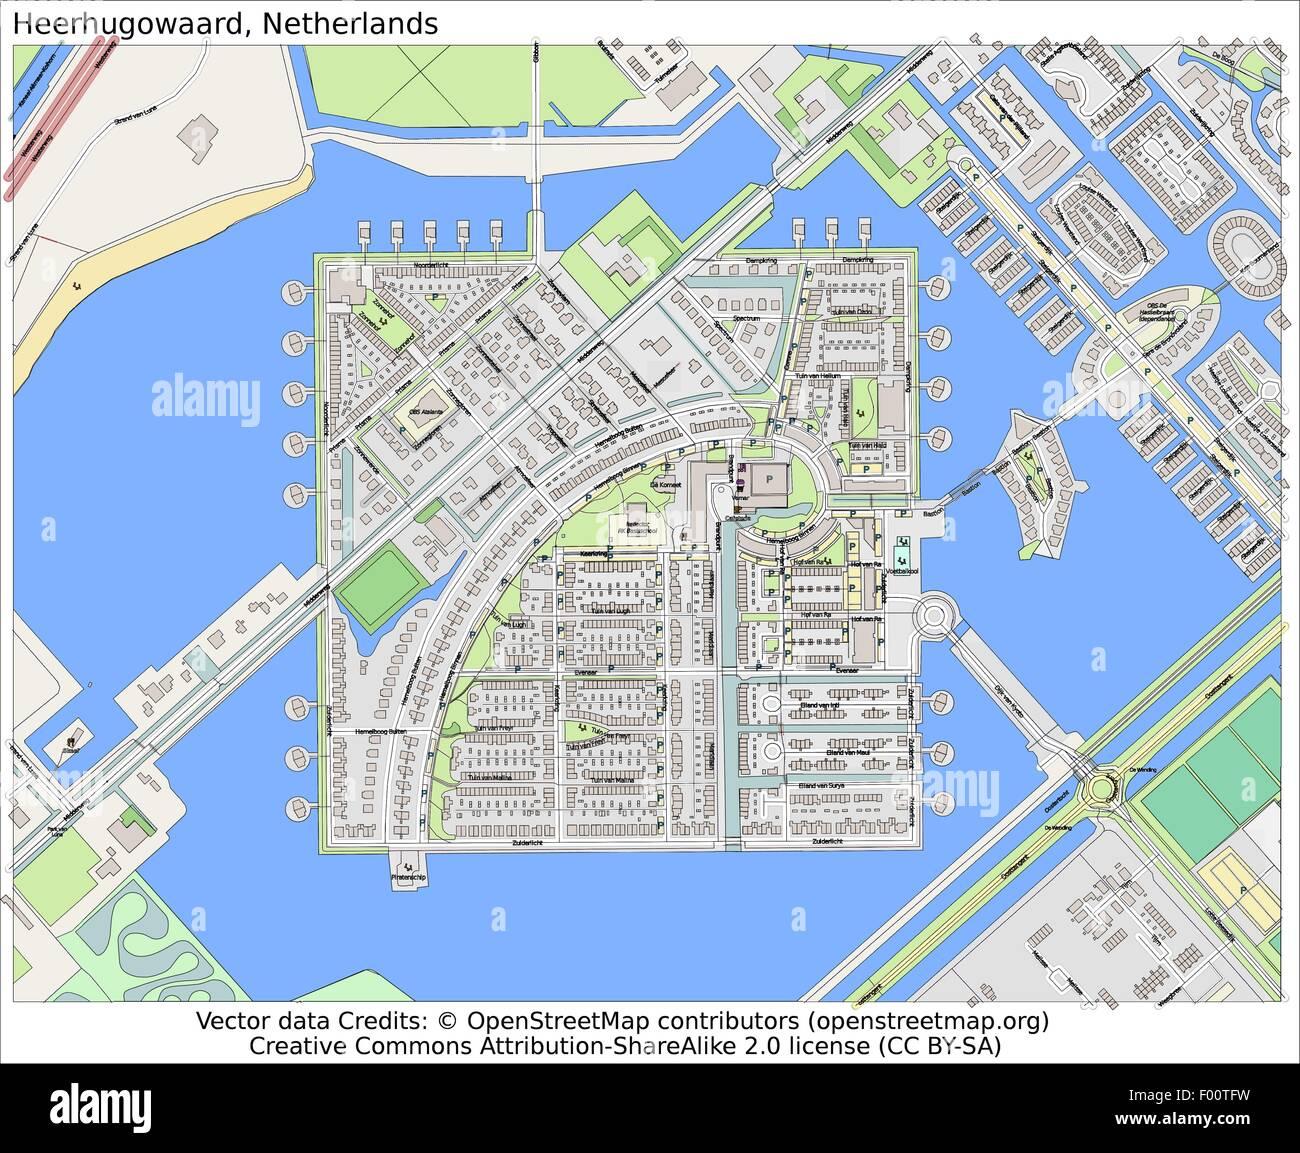 heerhugowaard netherlands country city island state location map